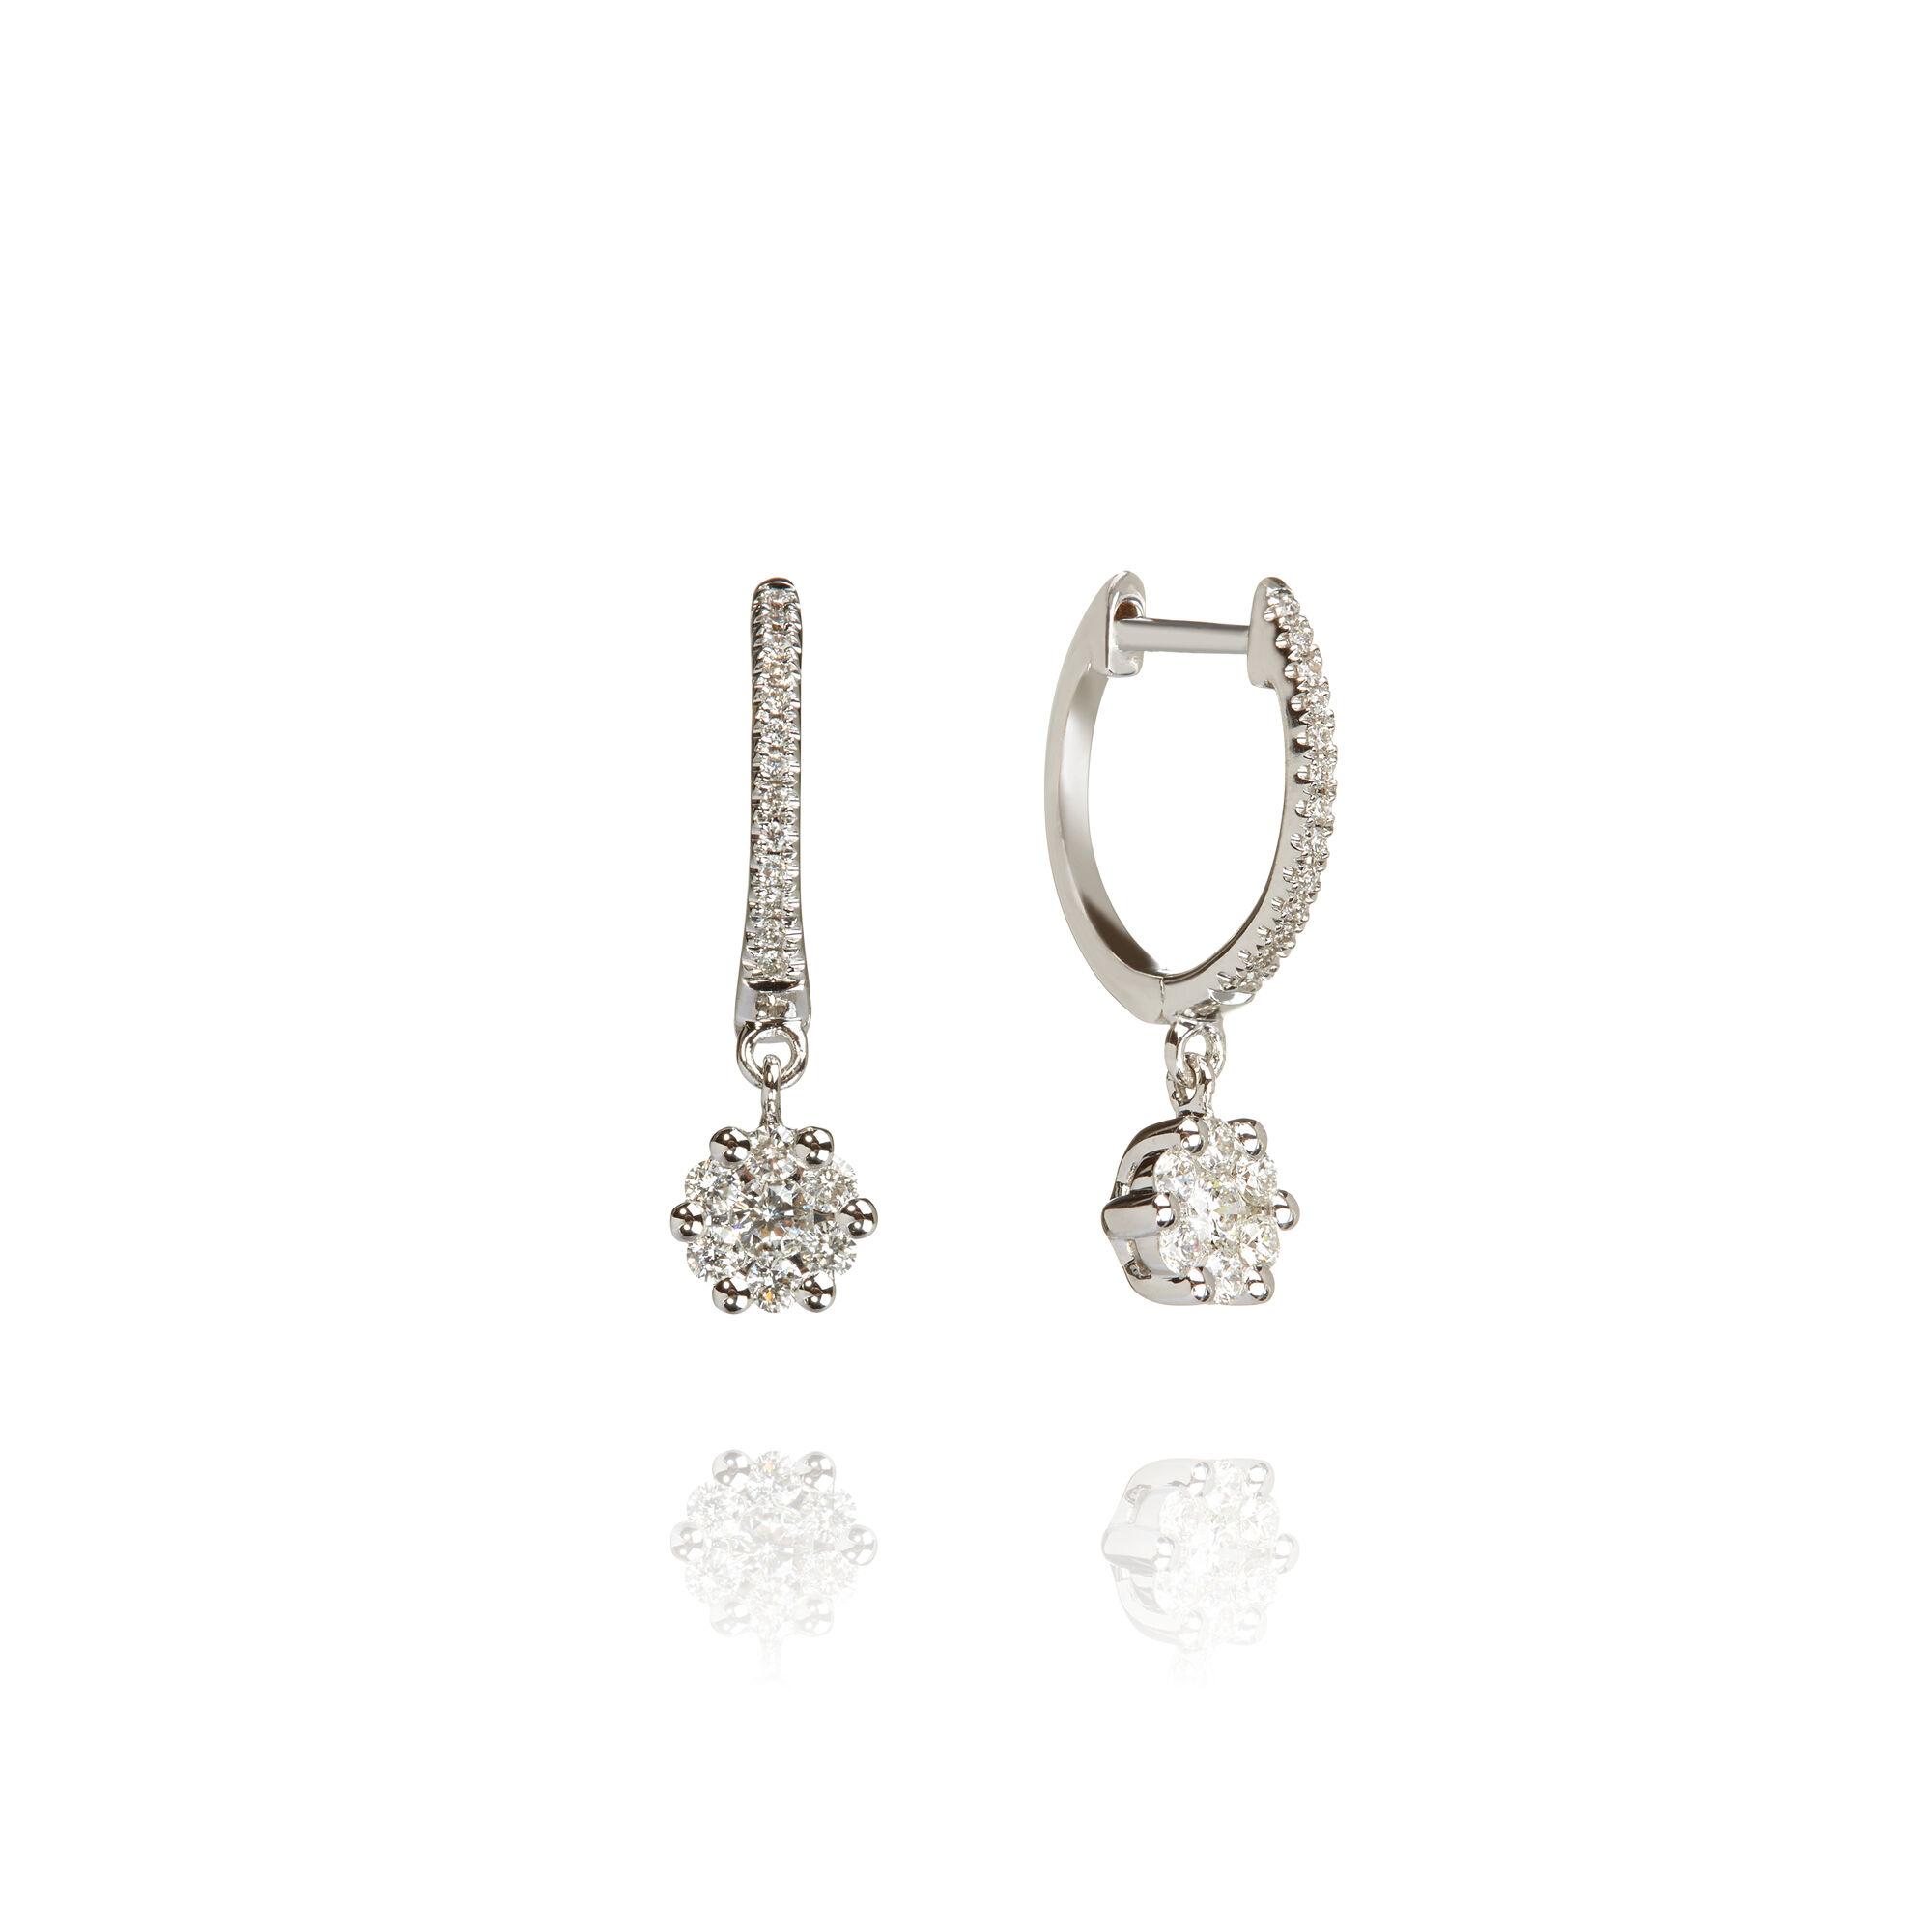 1d1b1ff5b4ebf Daisy 18ct White Gold Diamond Hoop Earrings